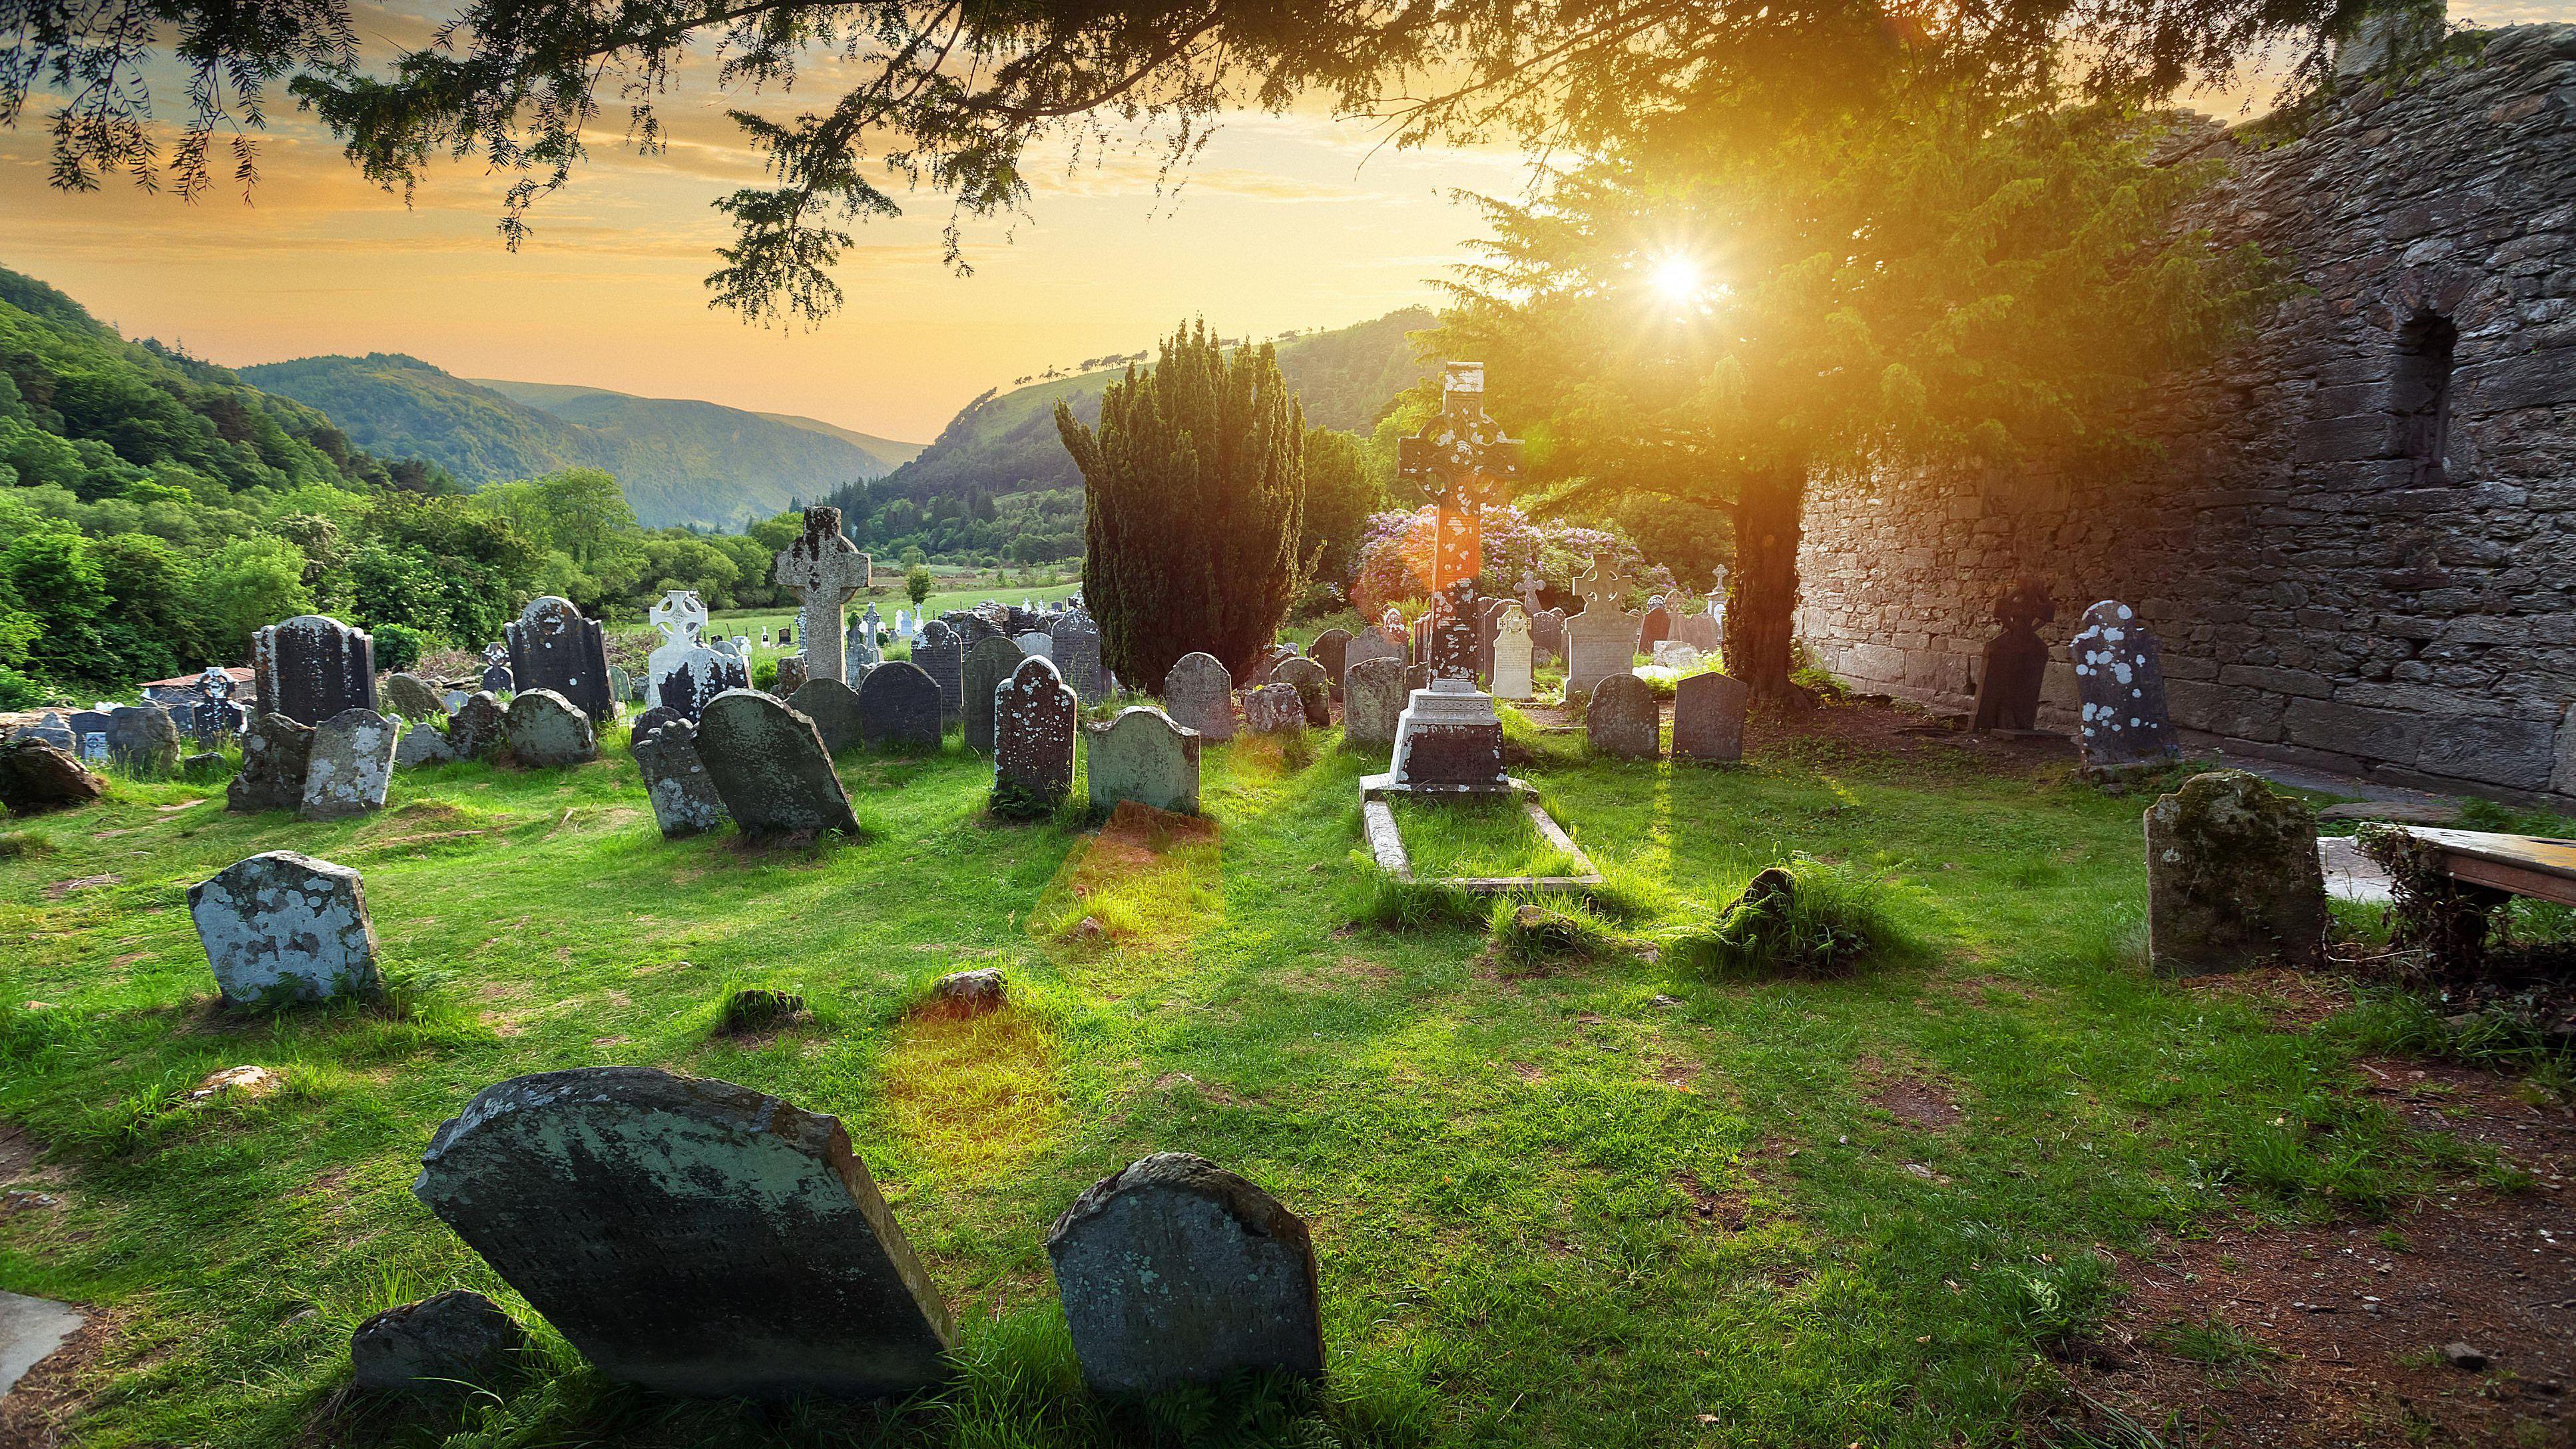 the-cemetery-at-the-glendalough-monastic-site-in-country-wicklow-ireland-512480108-58b9cbff3df78c353c37b868.jpg